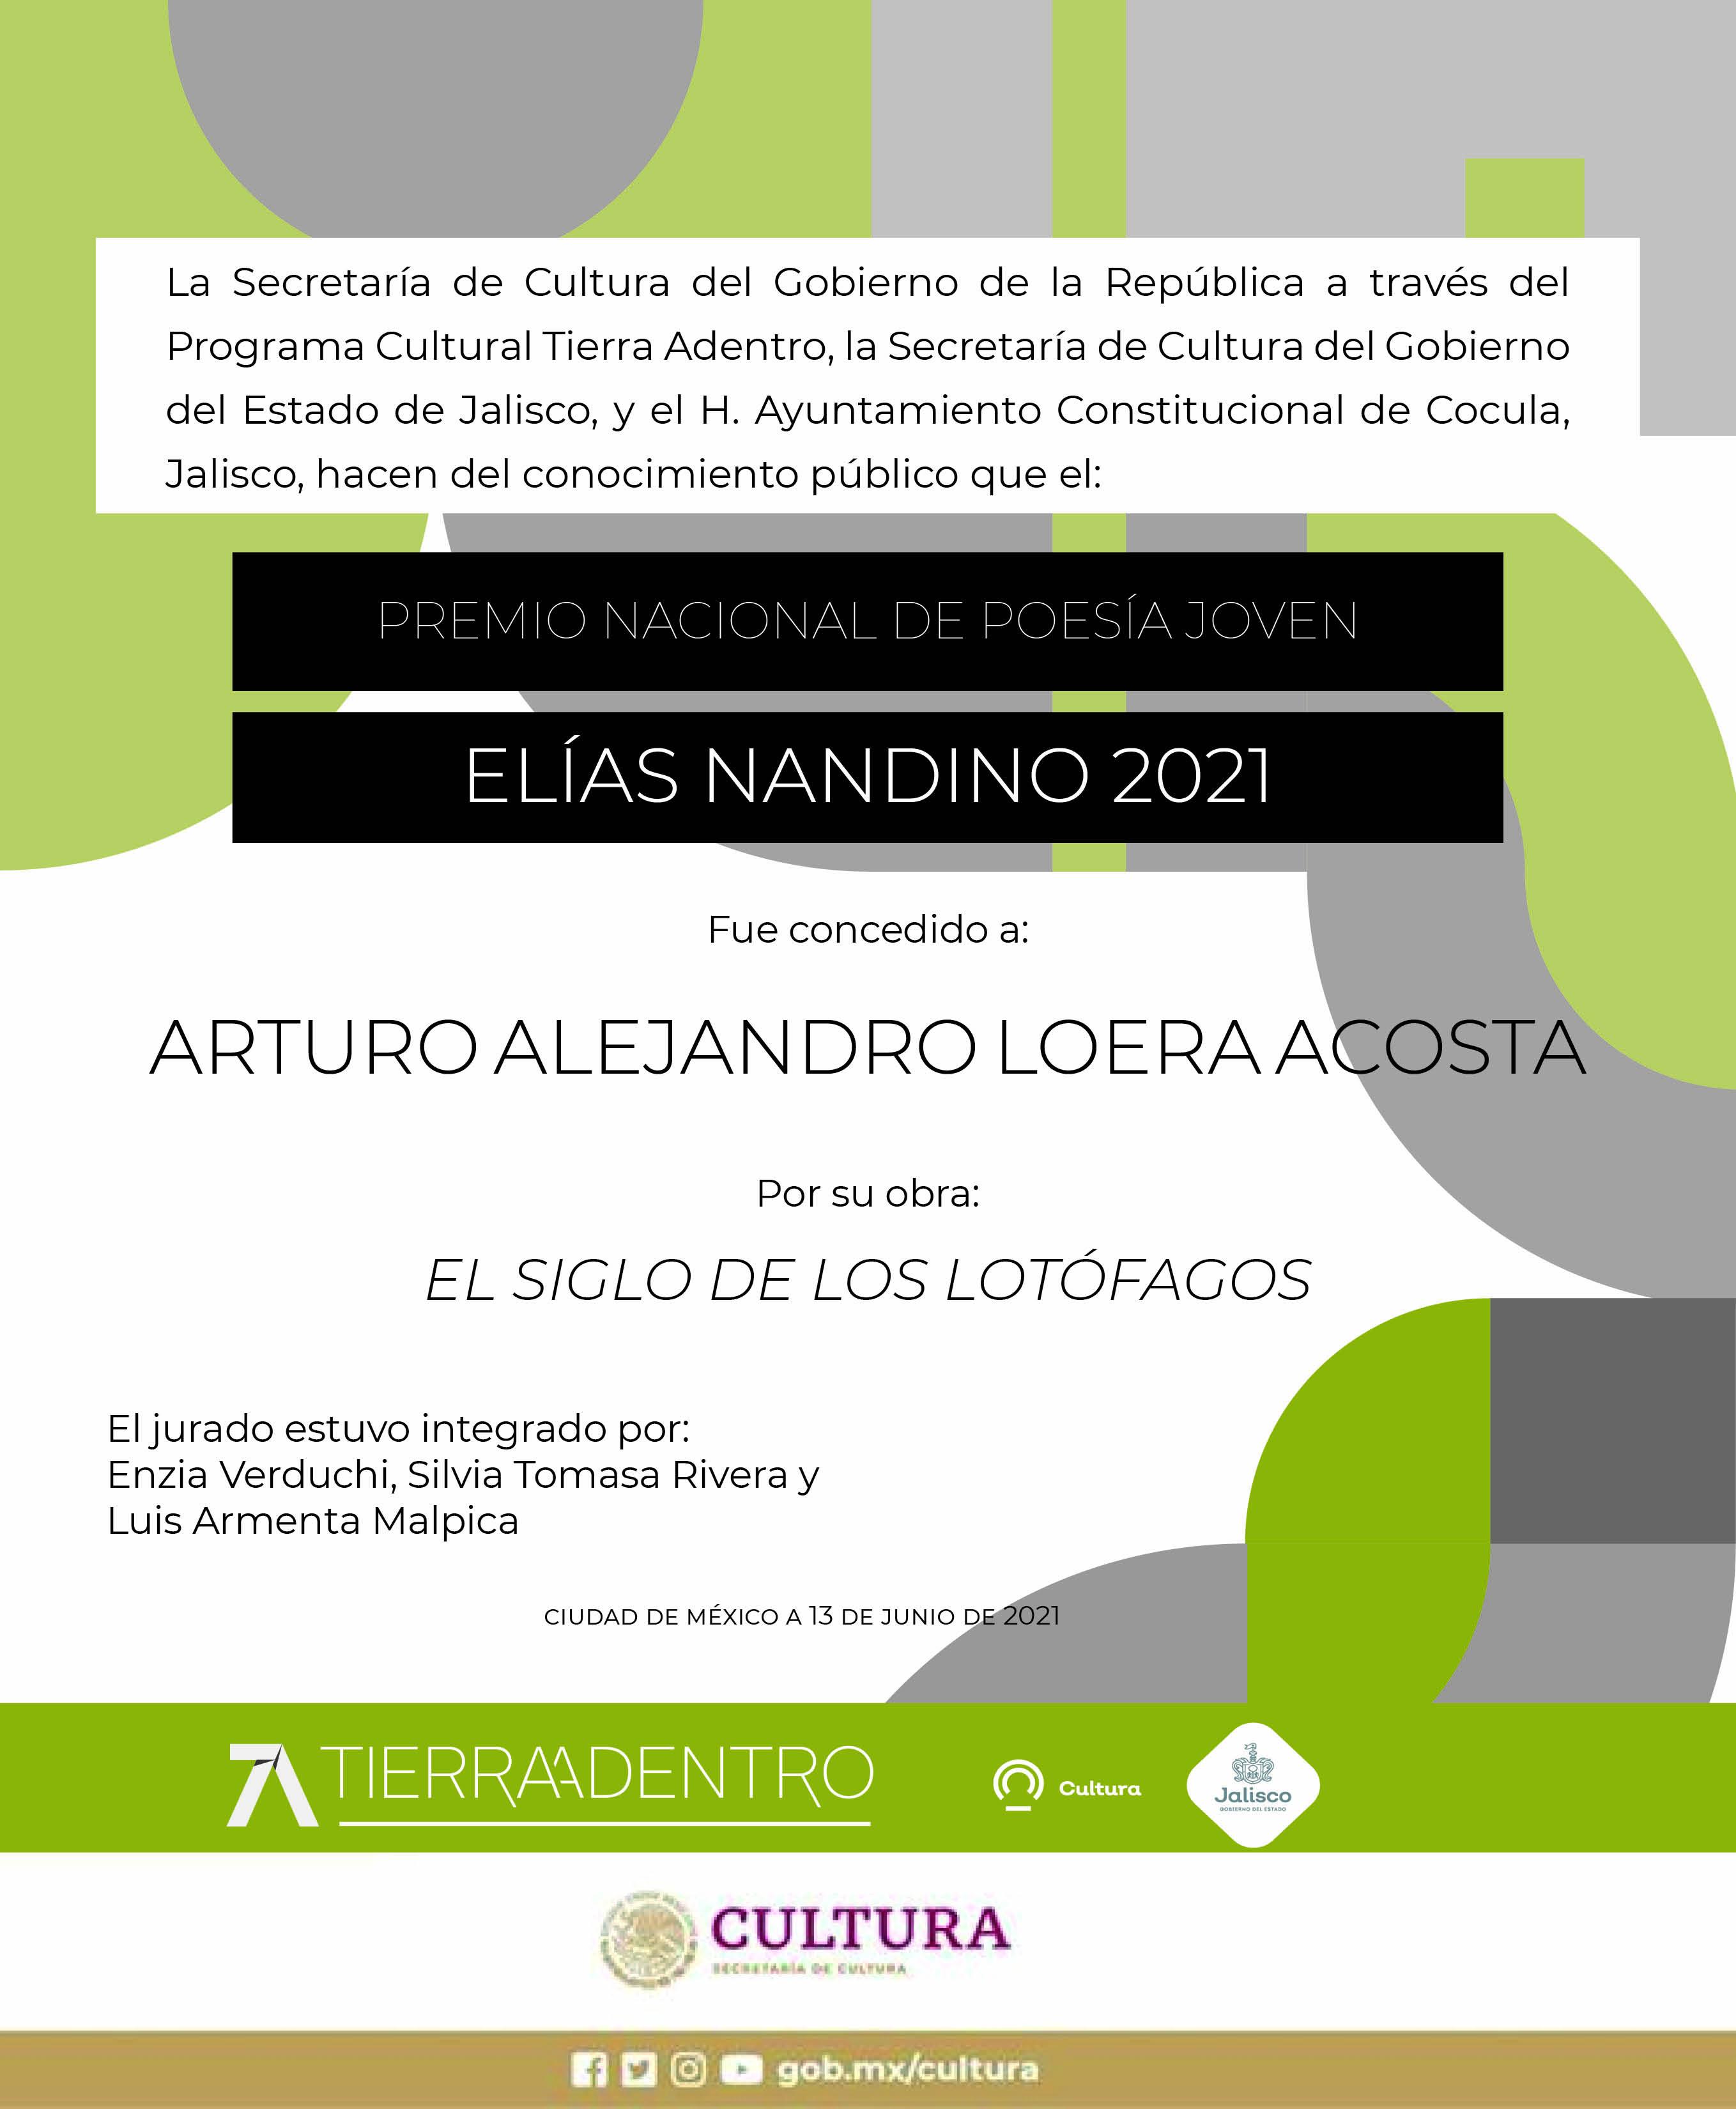 Eliìas Nandino 2021